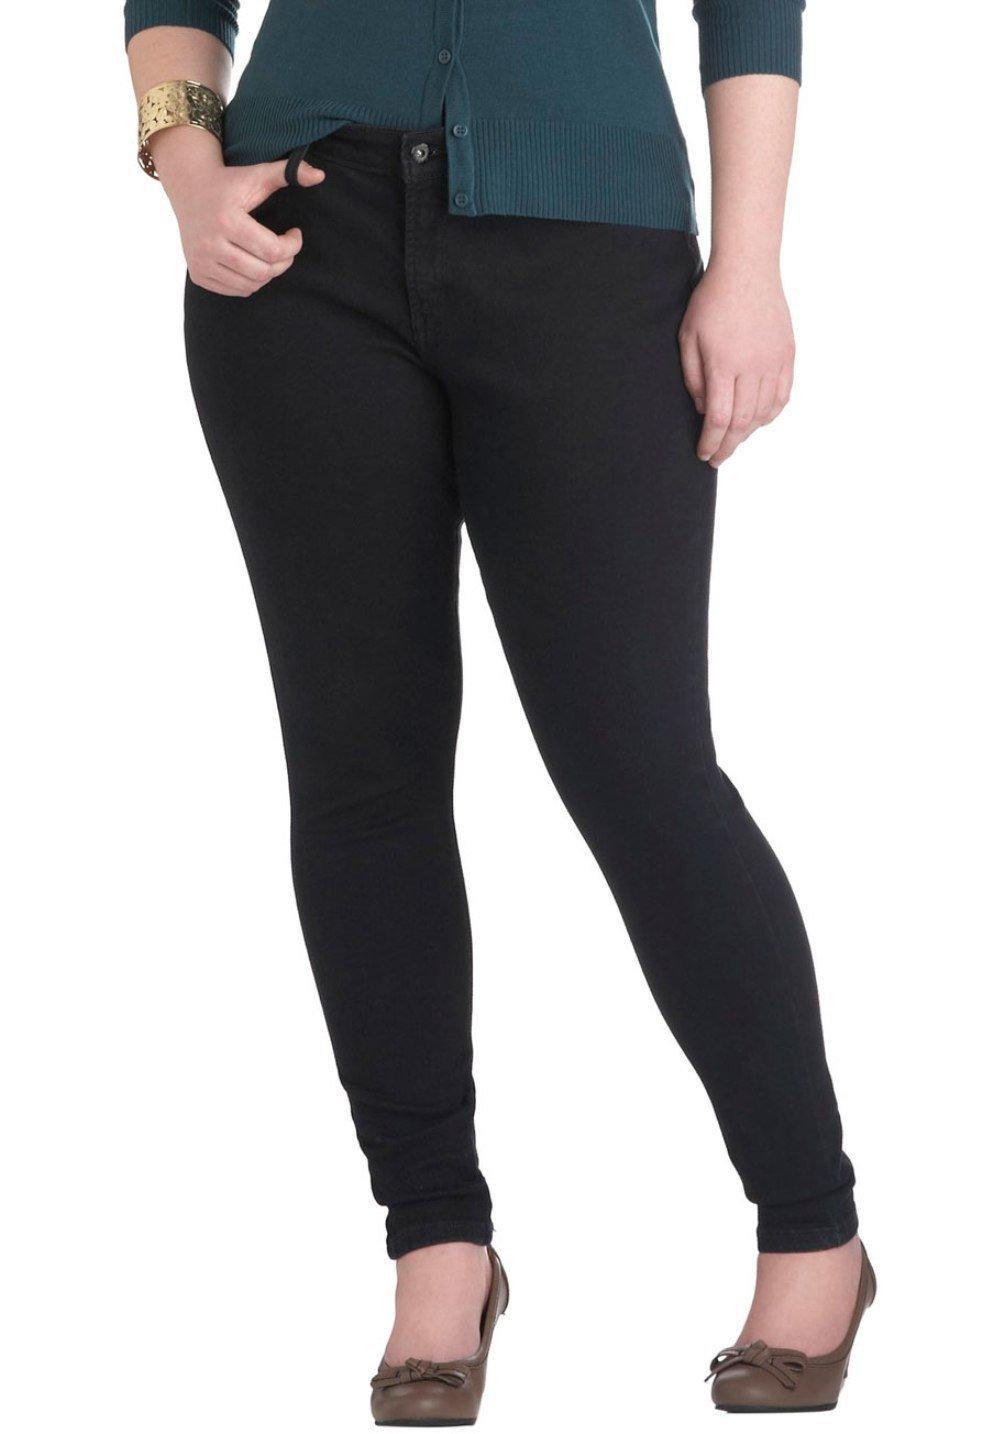 NEW 1826 PONTI HIGH WAIST WOMENS PLUS SIZE SKINNY LEG size - 14-16-18-20-22 (PL2676) (16, BLACK)